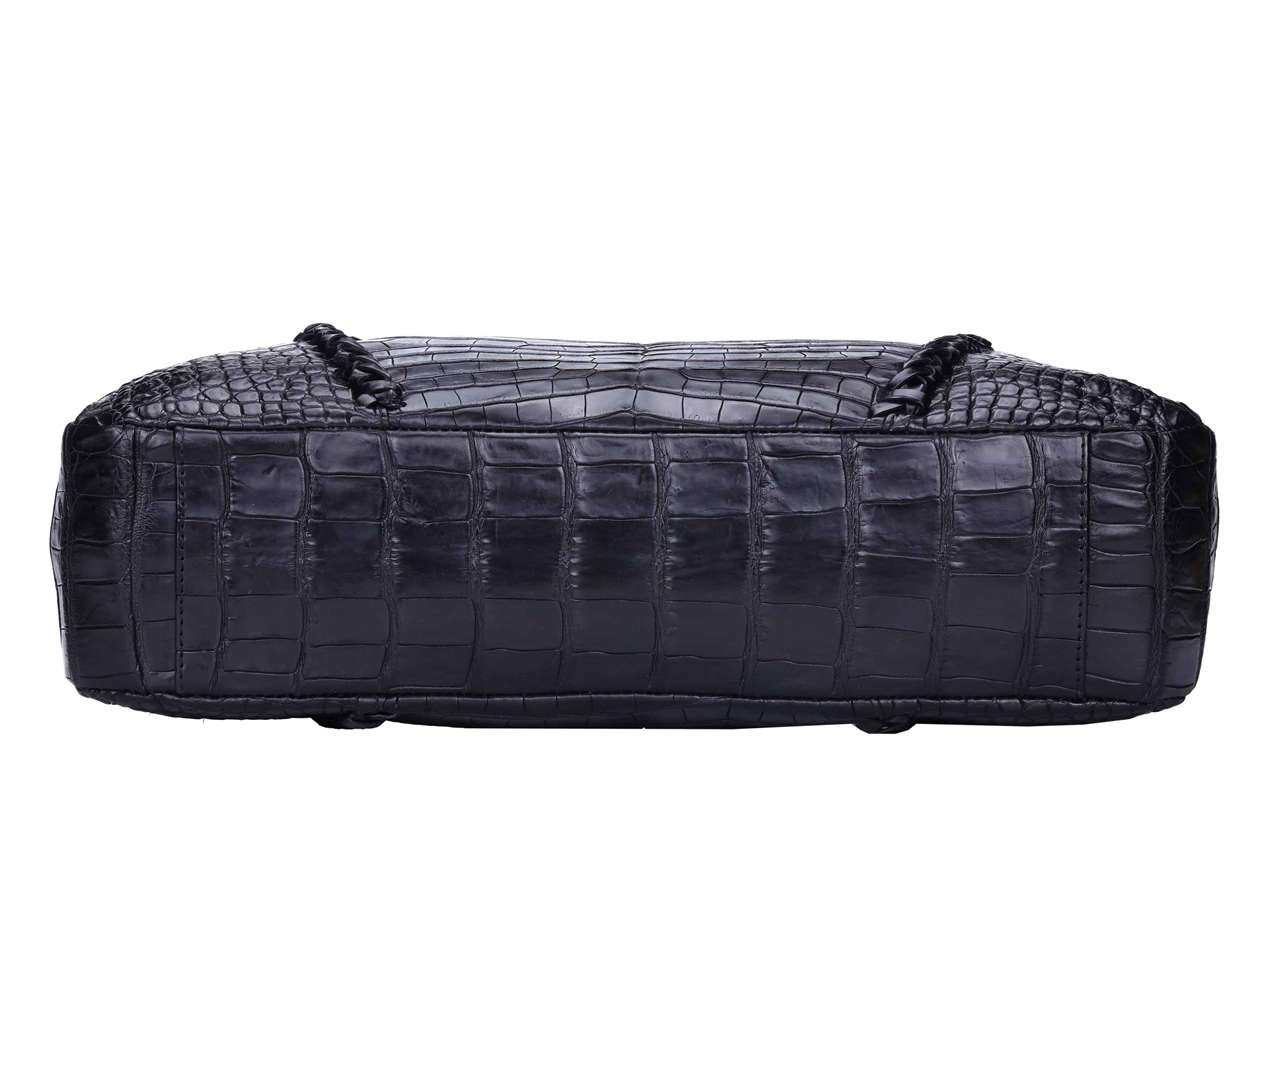 GF bags-Custom Latest Handbags Manufacturer, Cheap Handbags Online | Handbag-6